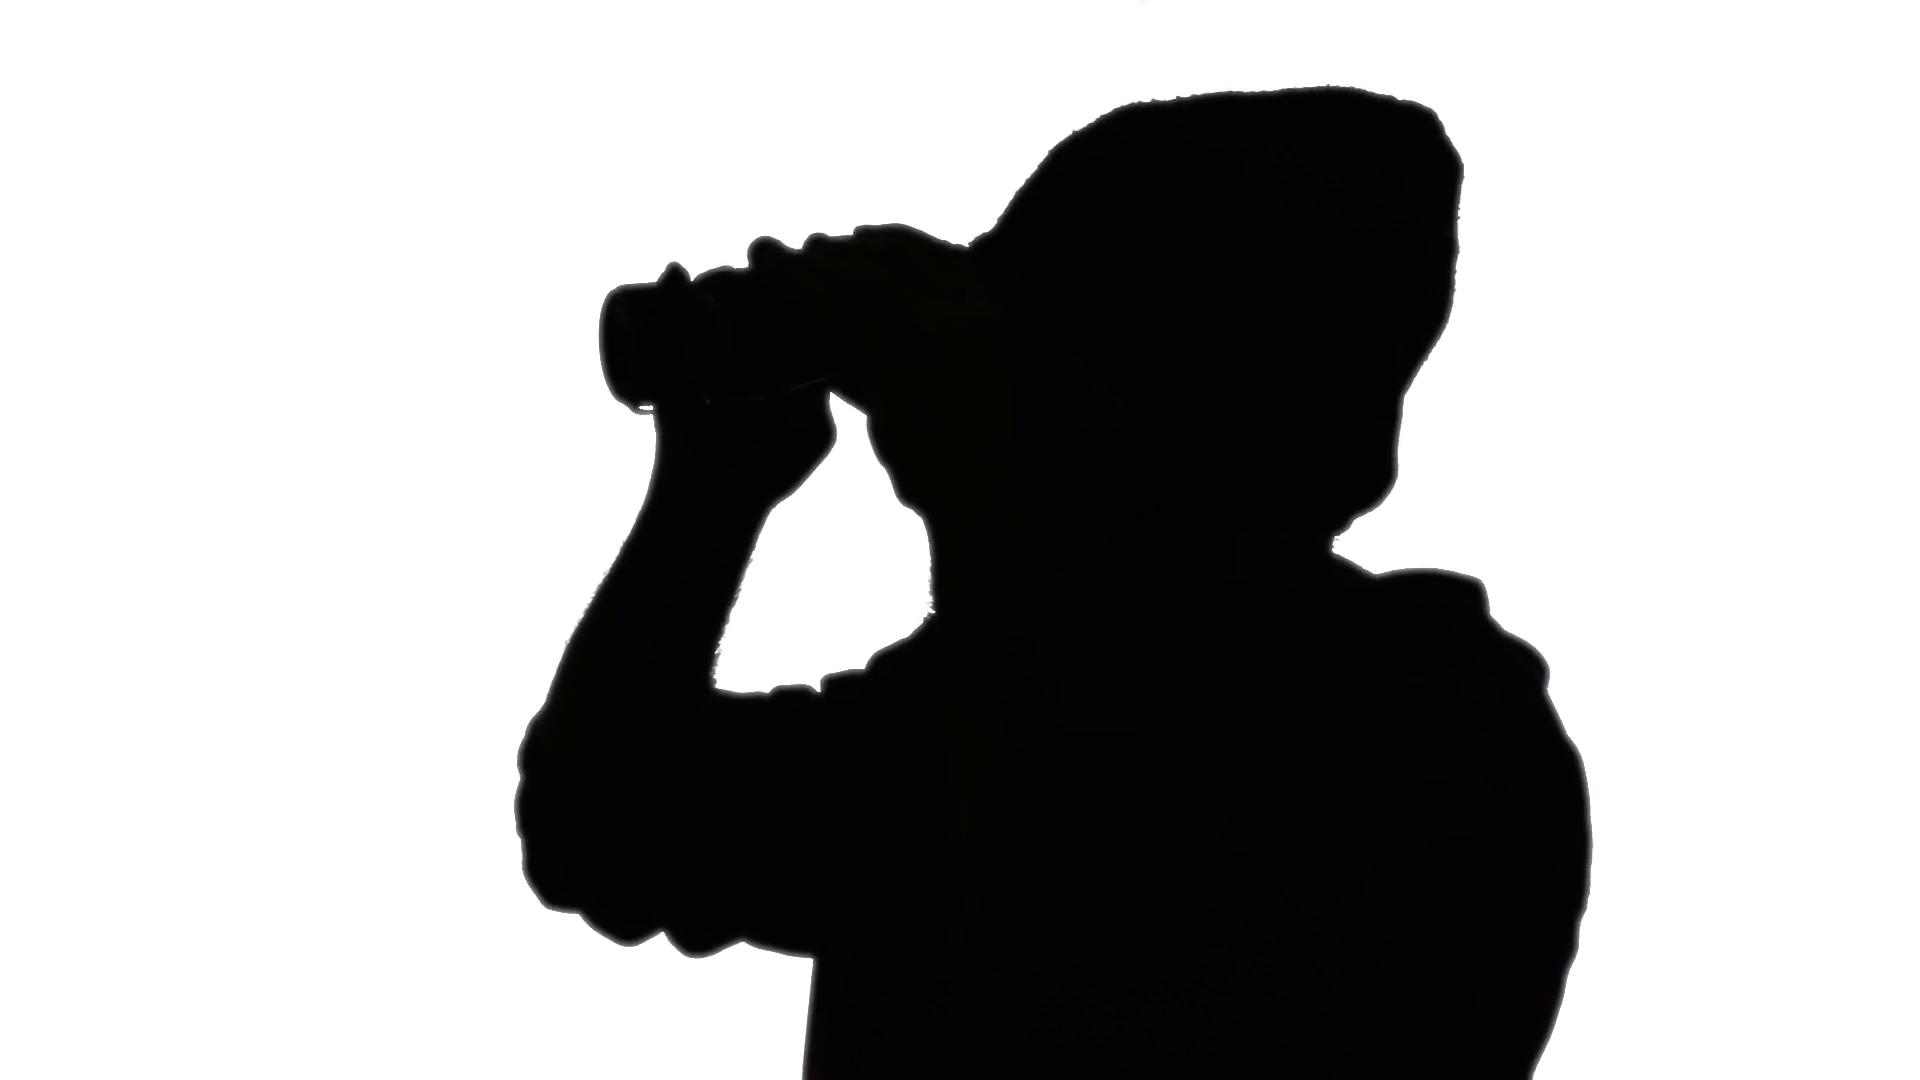 Silhouette man binoculars. A man looking around through a pair of binoculars.  Silhouette shot. Stock Video Footage - VideoBlocks - Looking Through Binoculars PNG